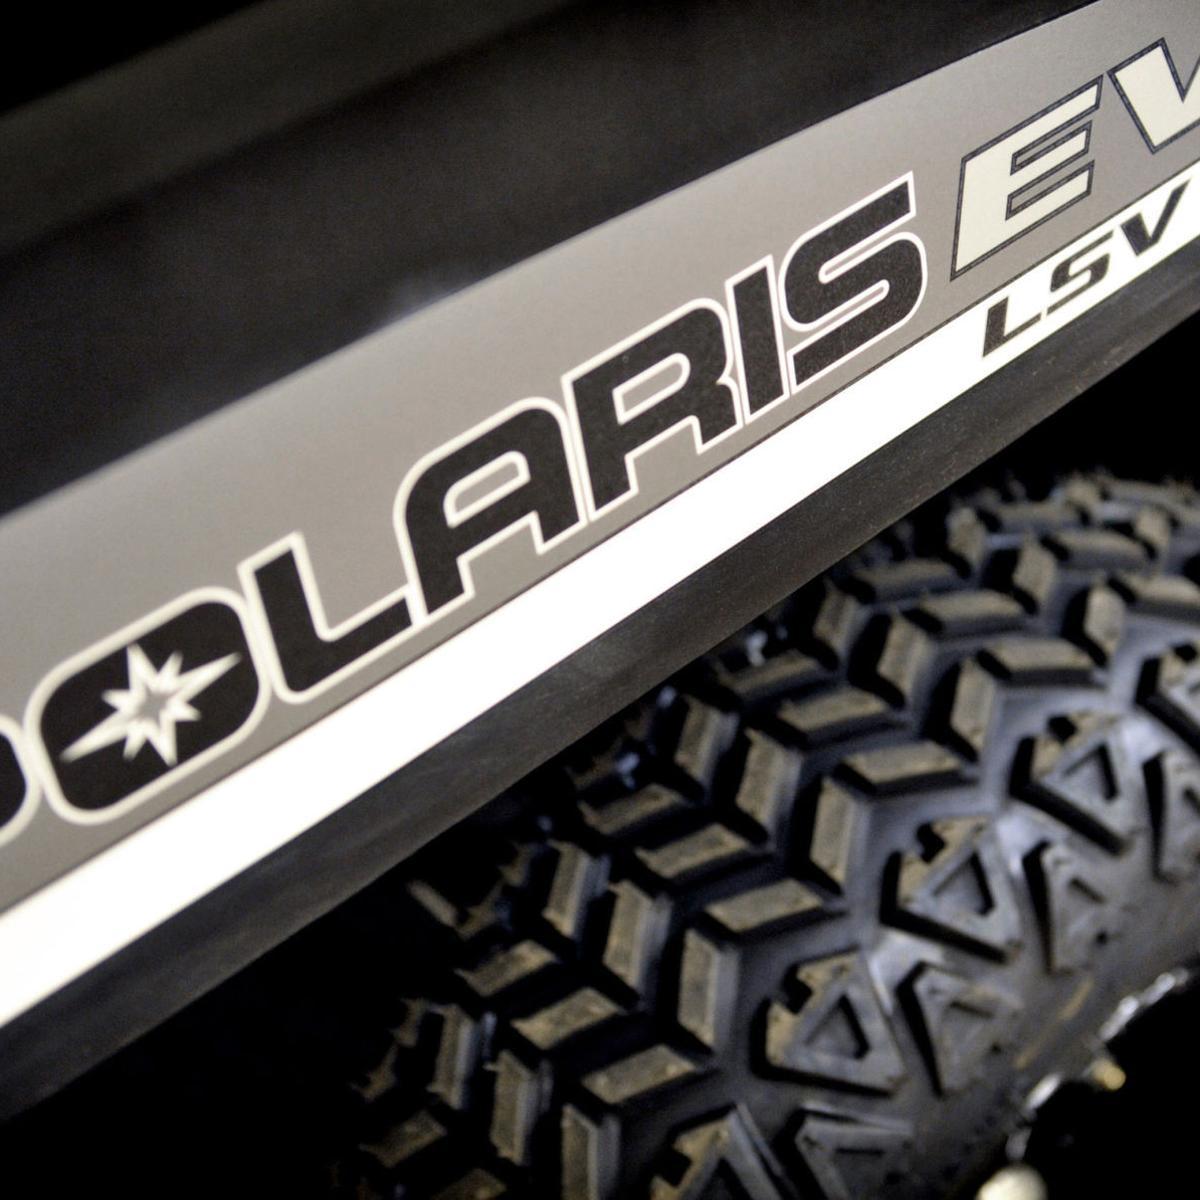 Polaris doubling down to keep customer loyalty despite